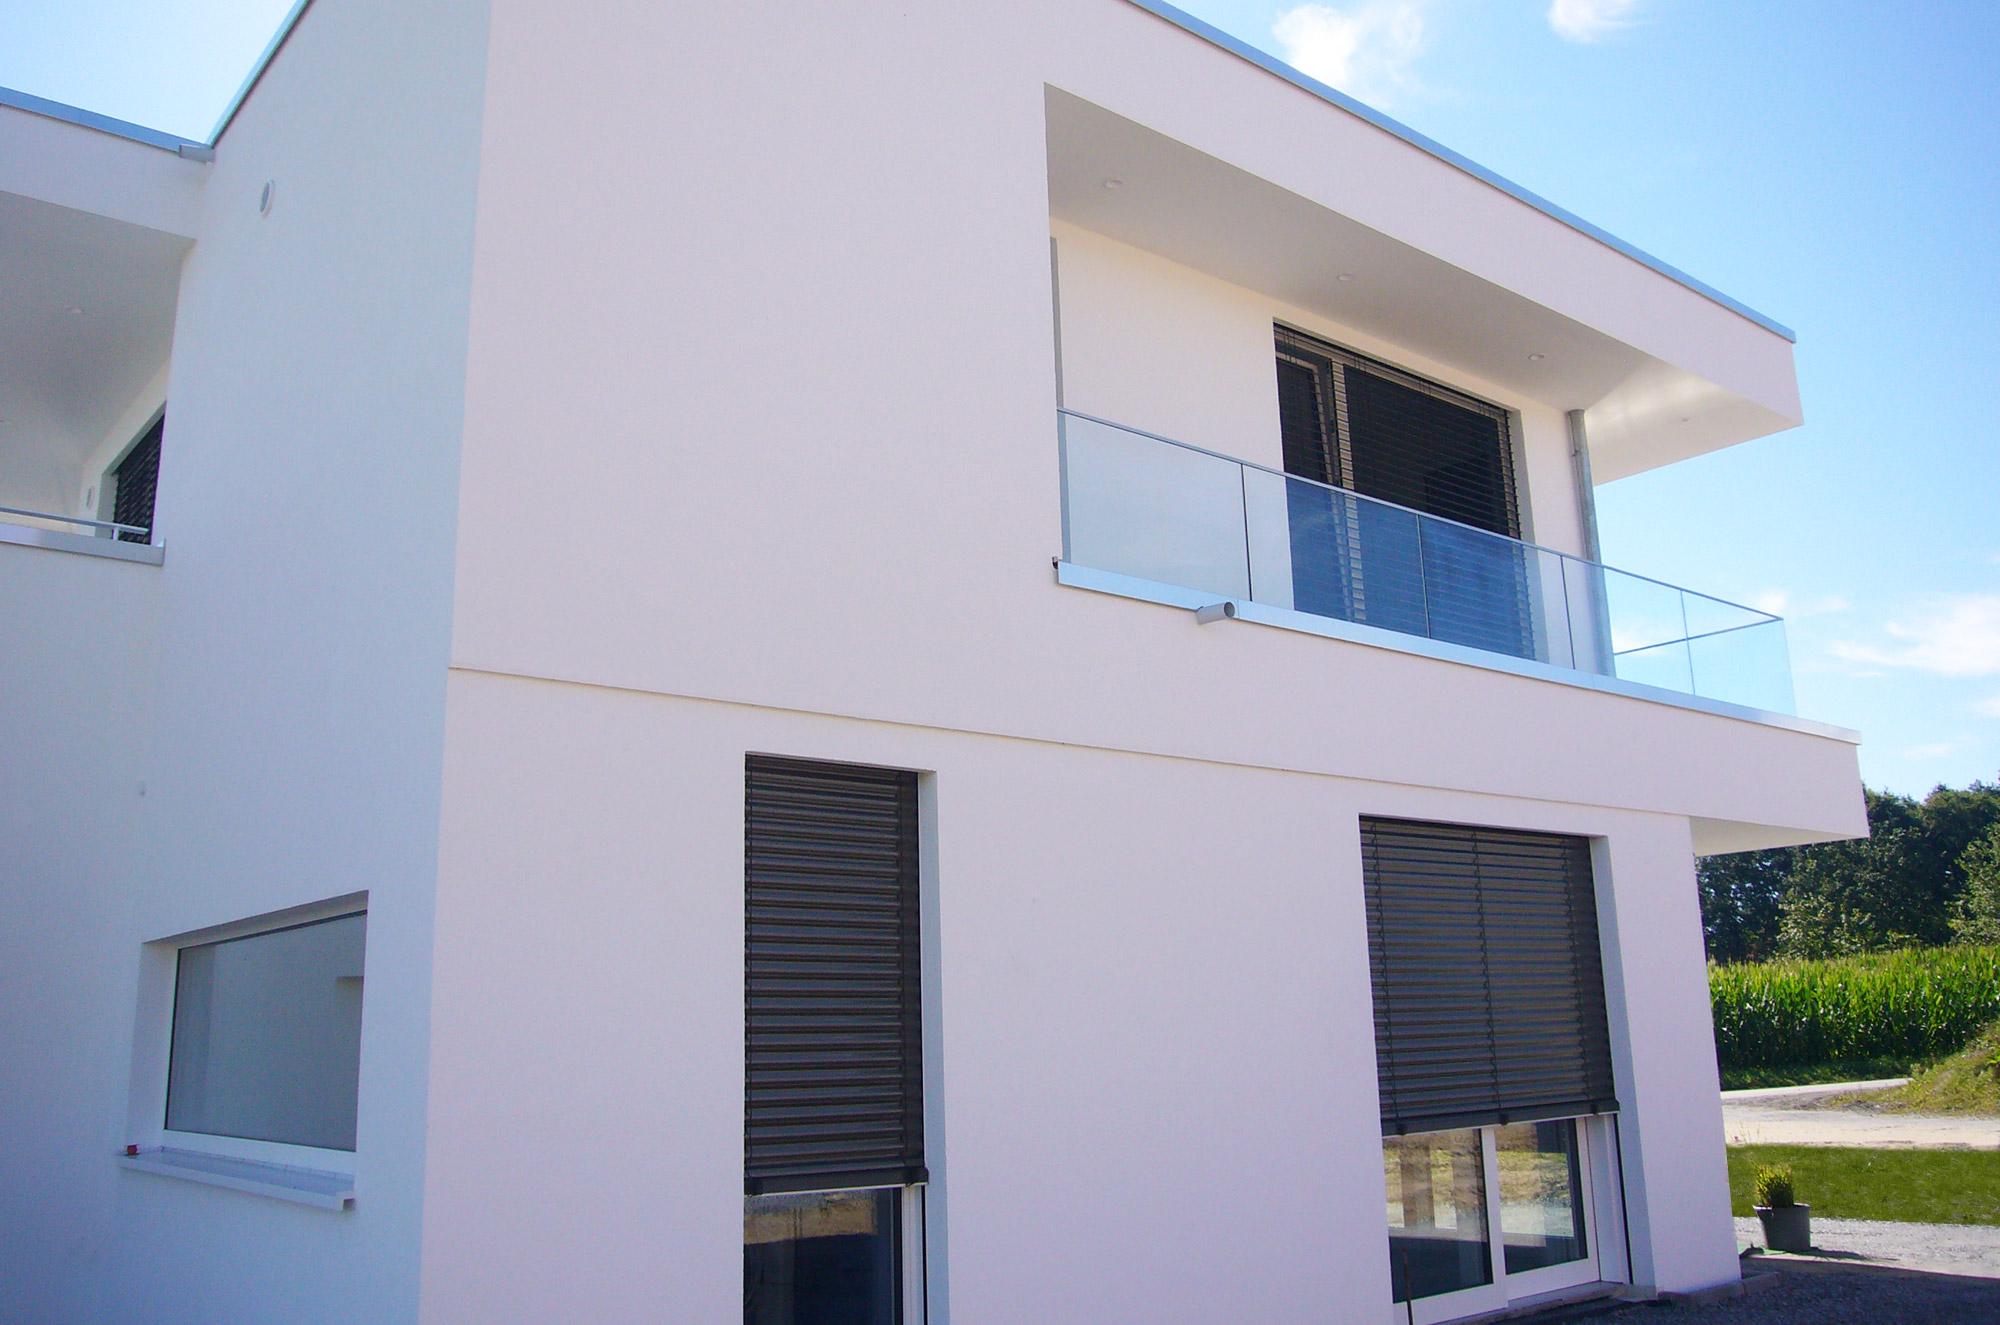 Haubau Soest Lippstadt Bauhaus